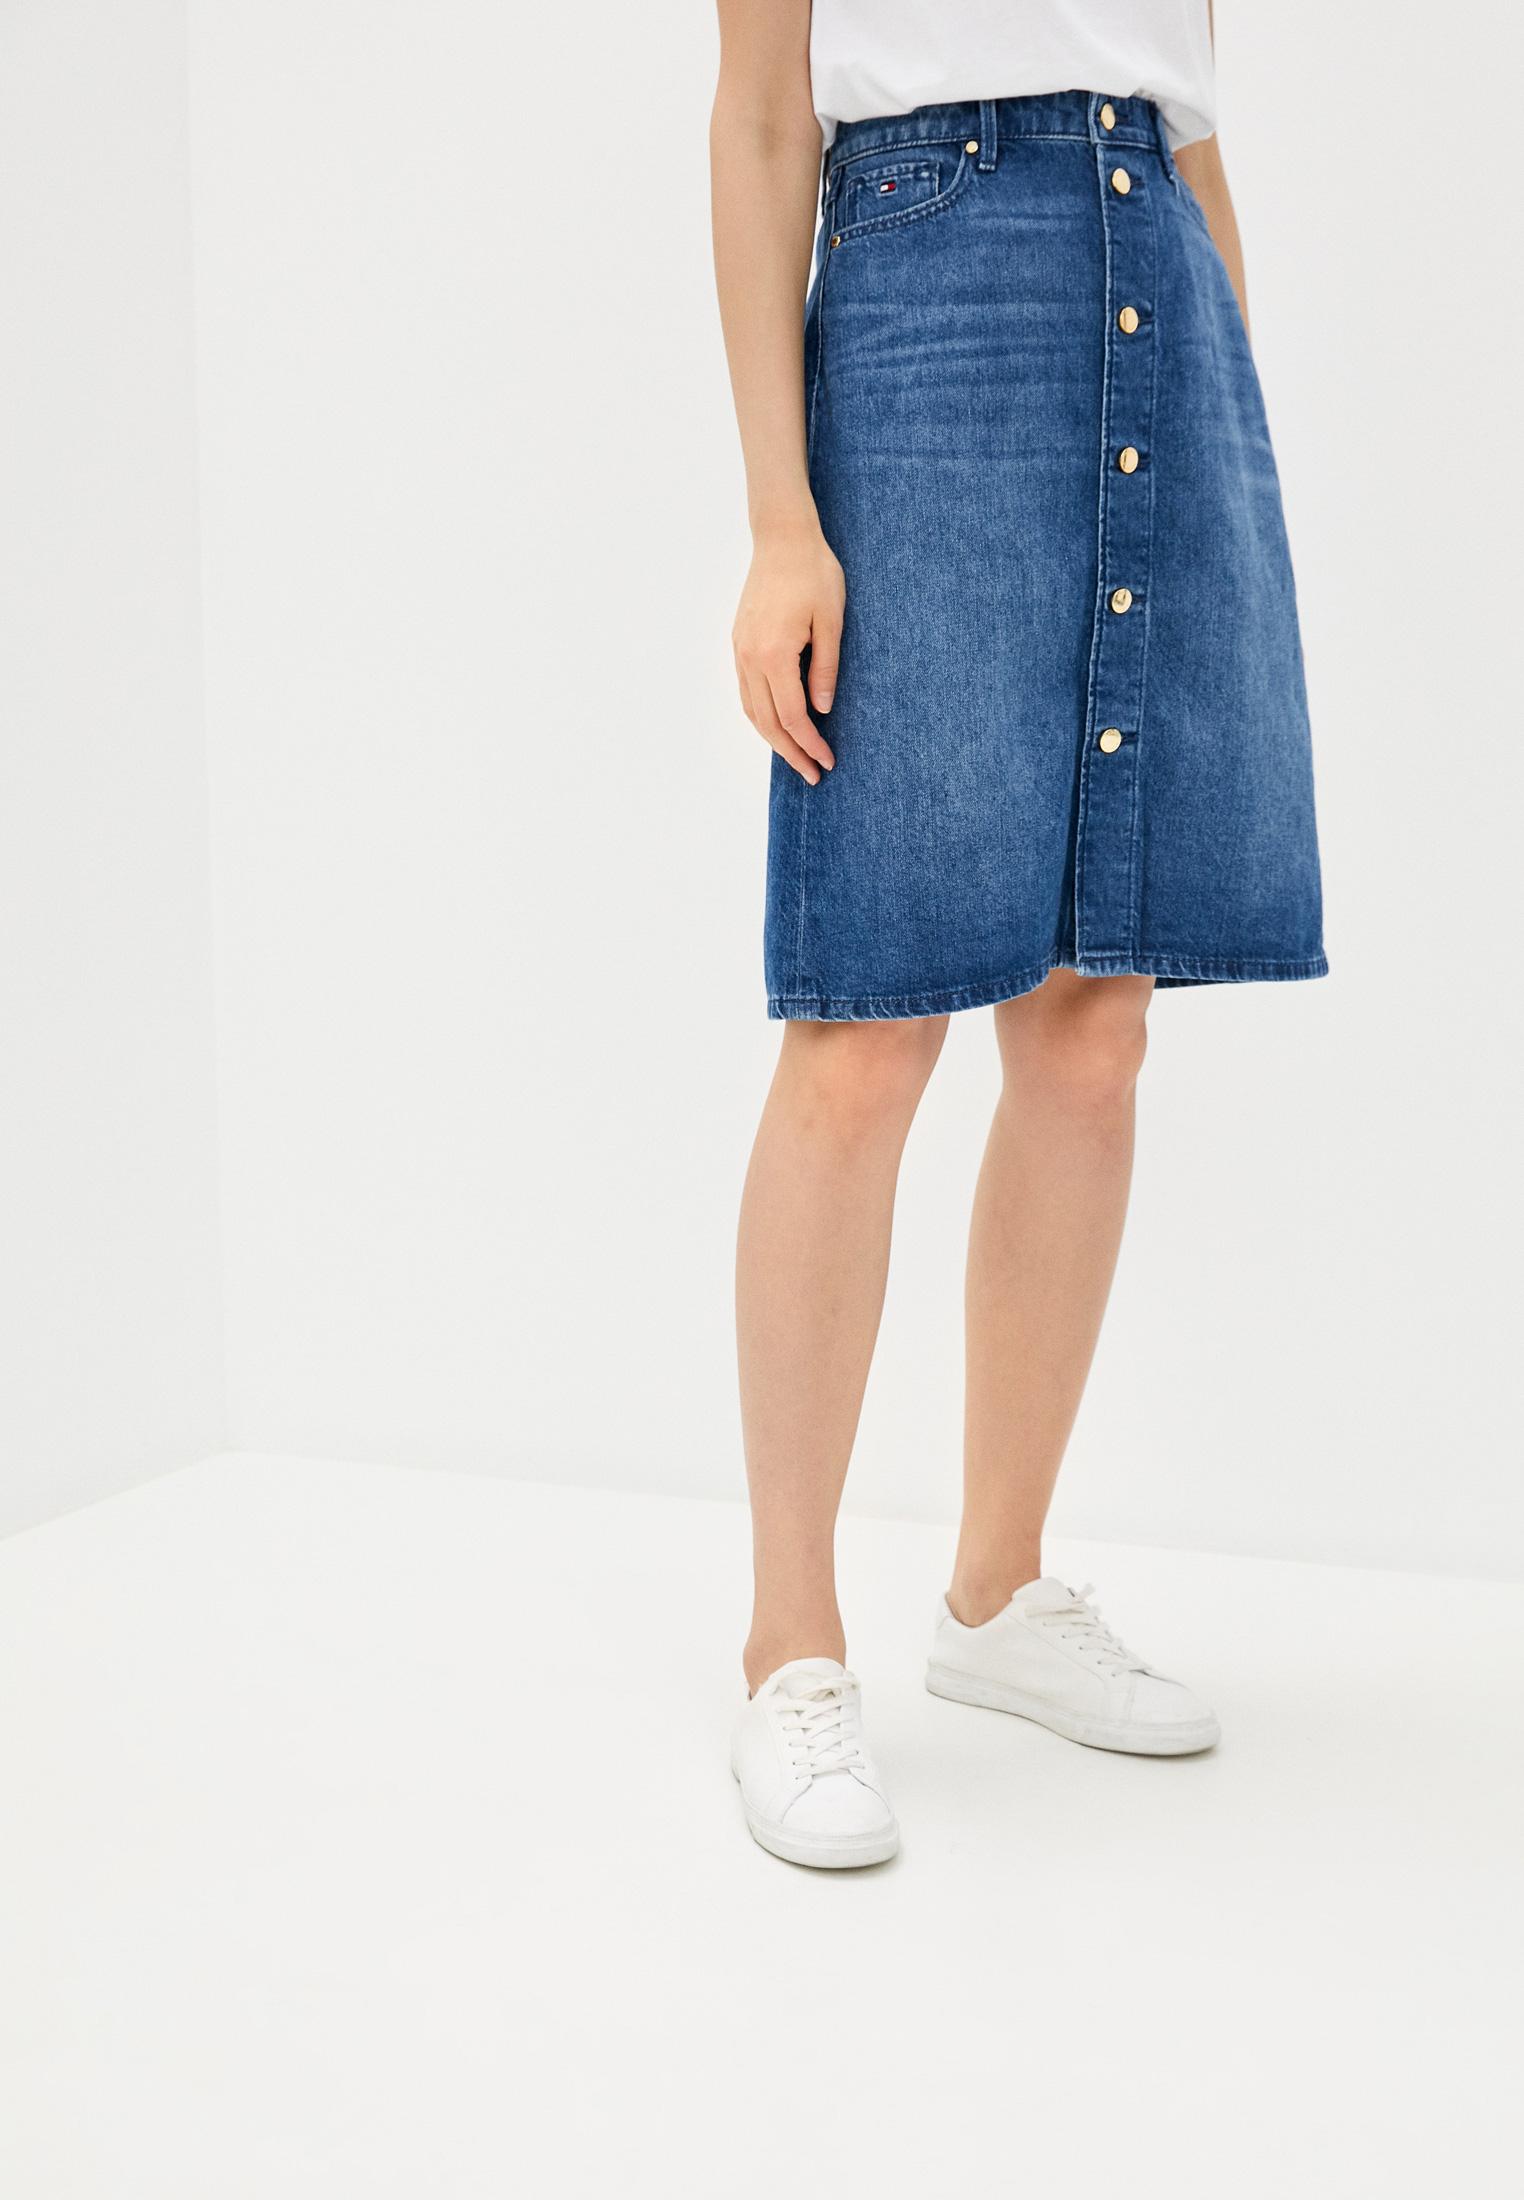 Широкая юбка Tommy Hilfiger (Томми Хилфигер) WW0WW28087